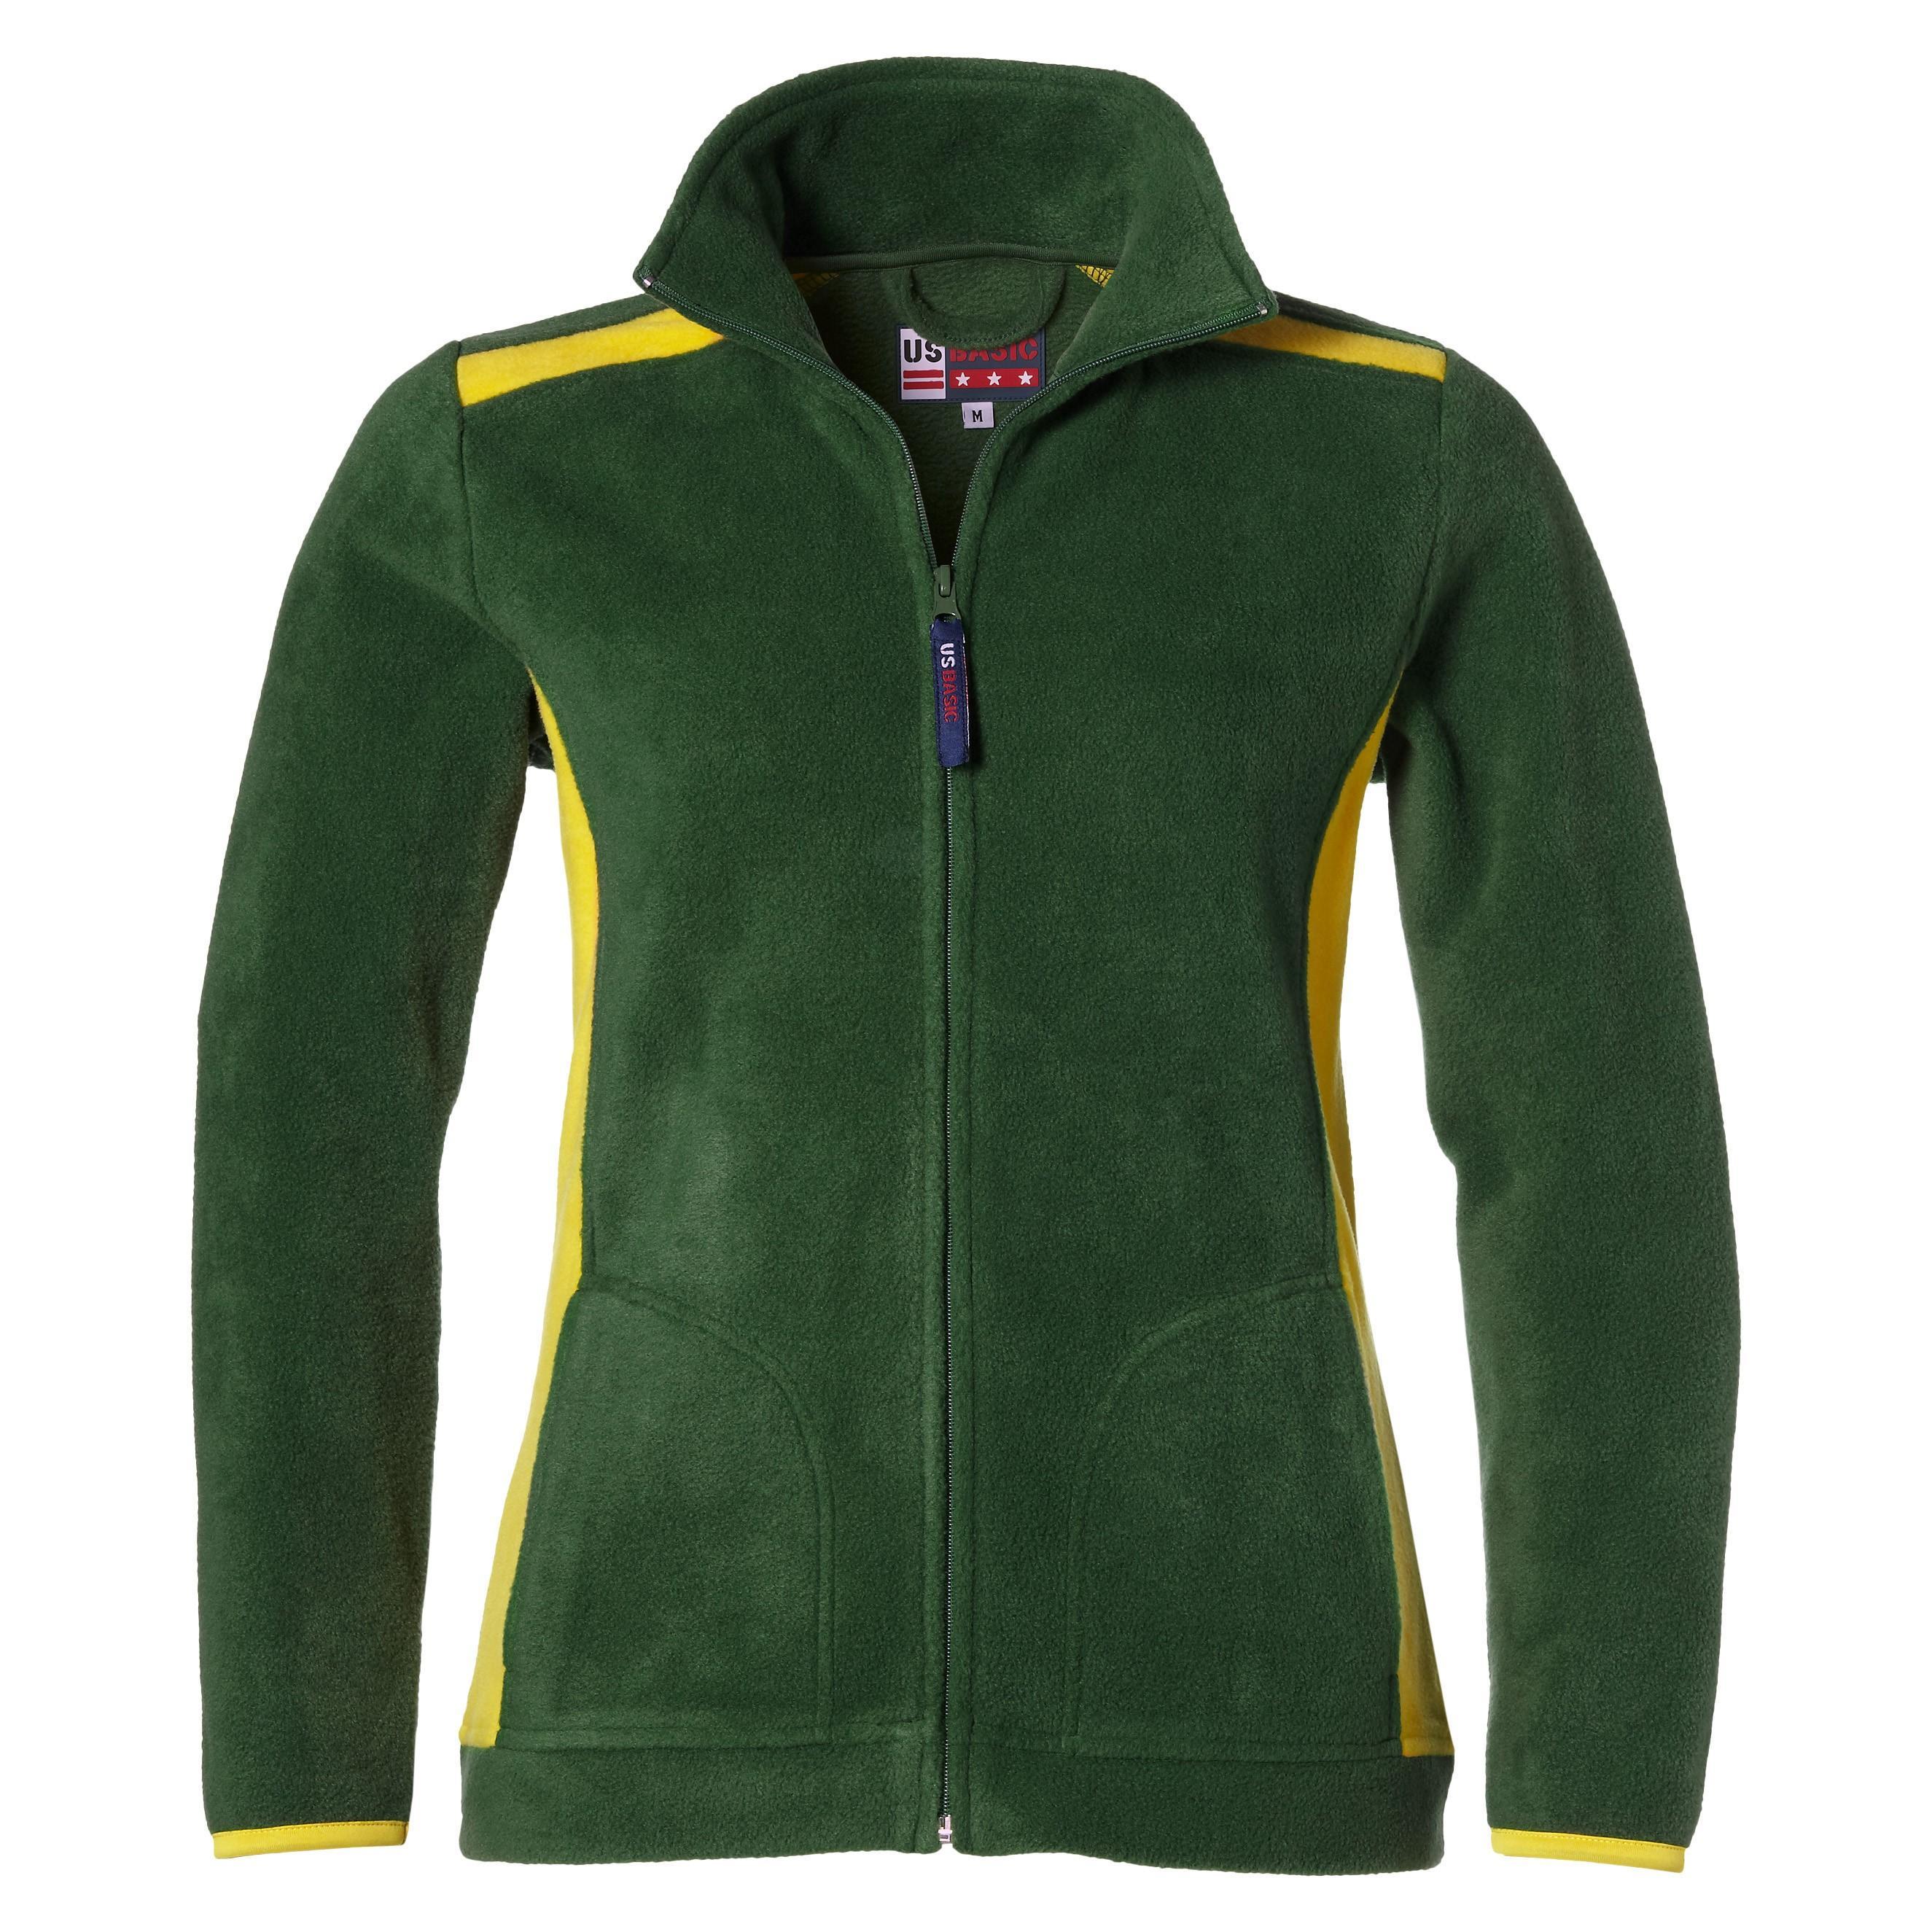 Ladies Brighton Fleece Jacket - Green Gold Only